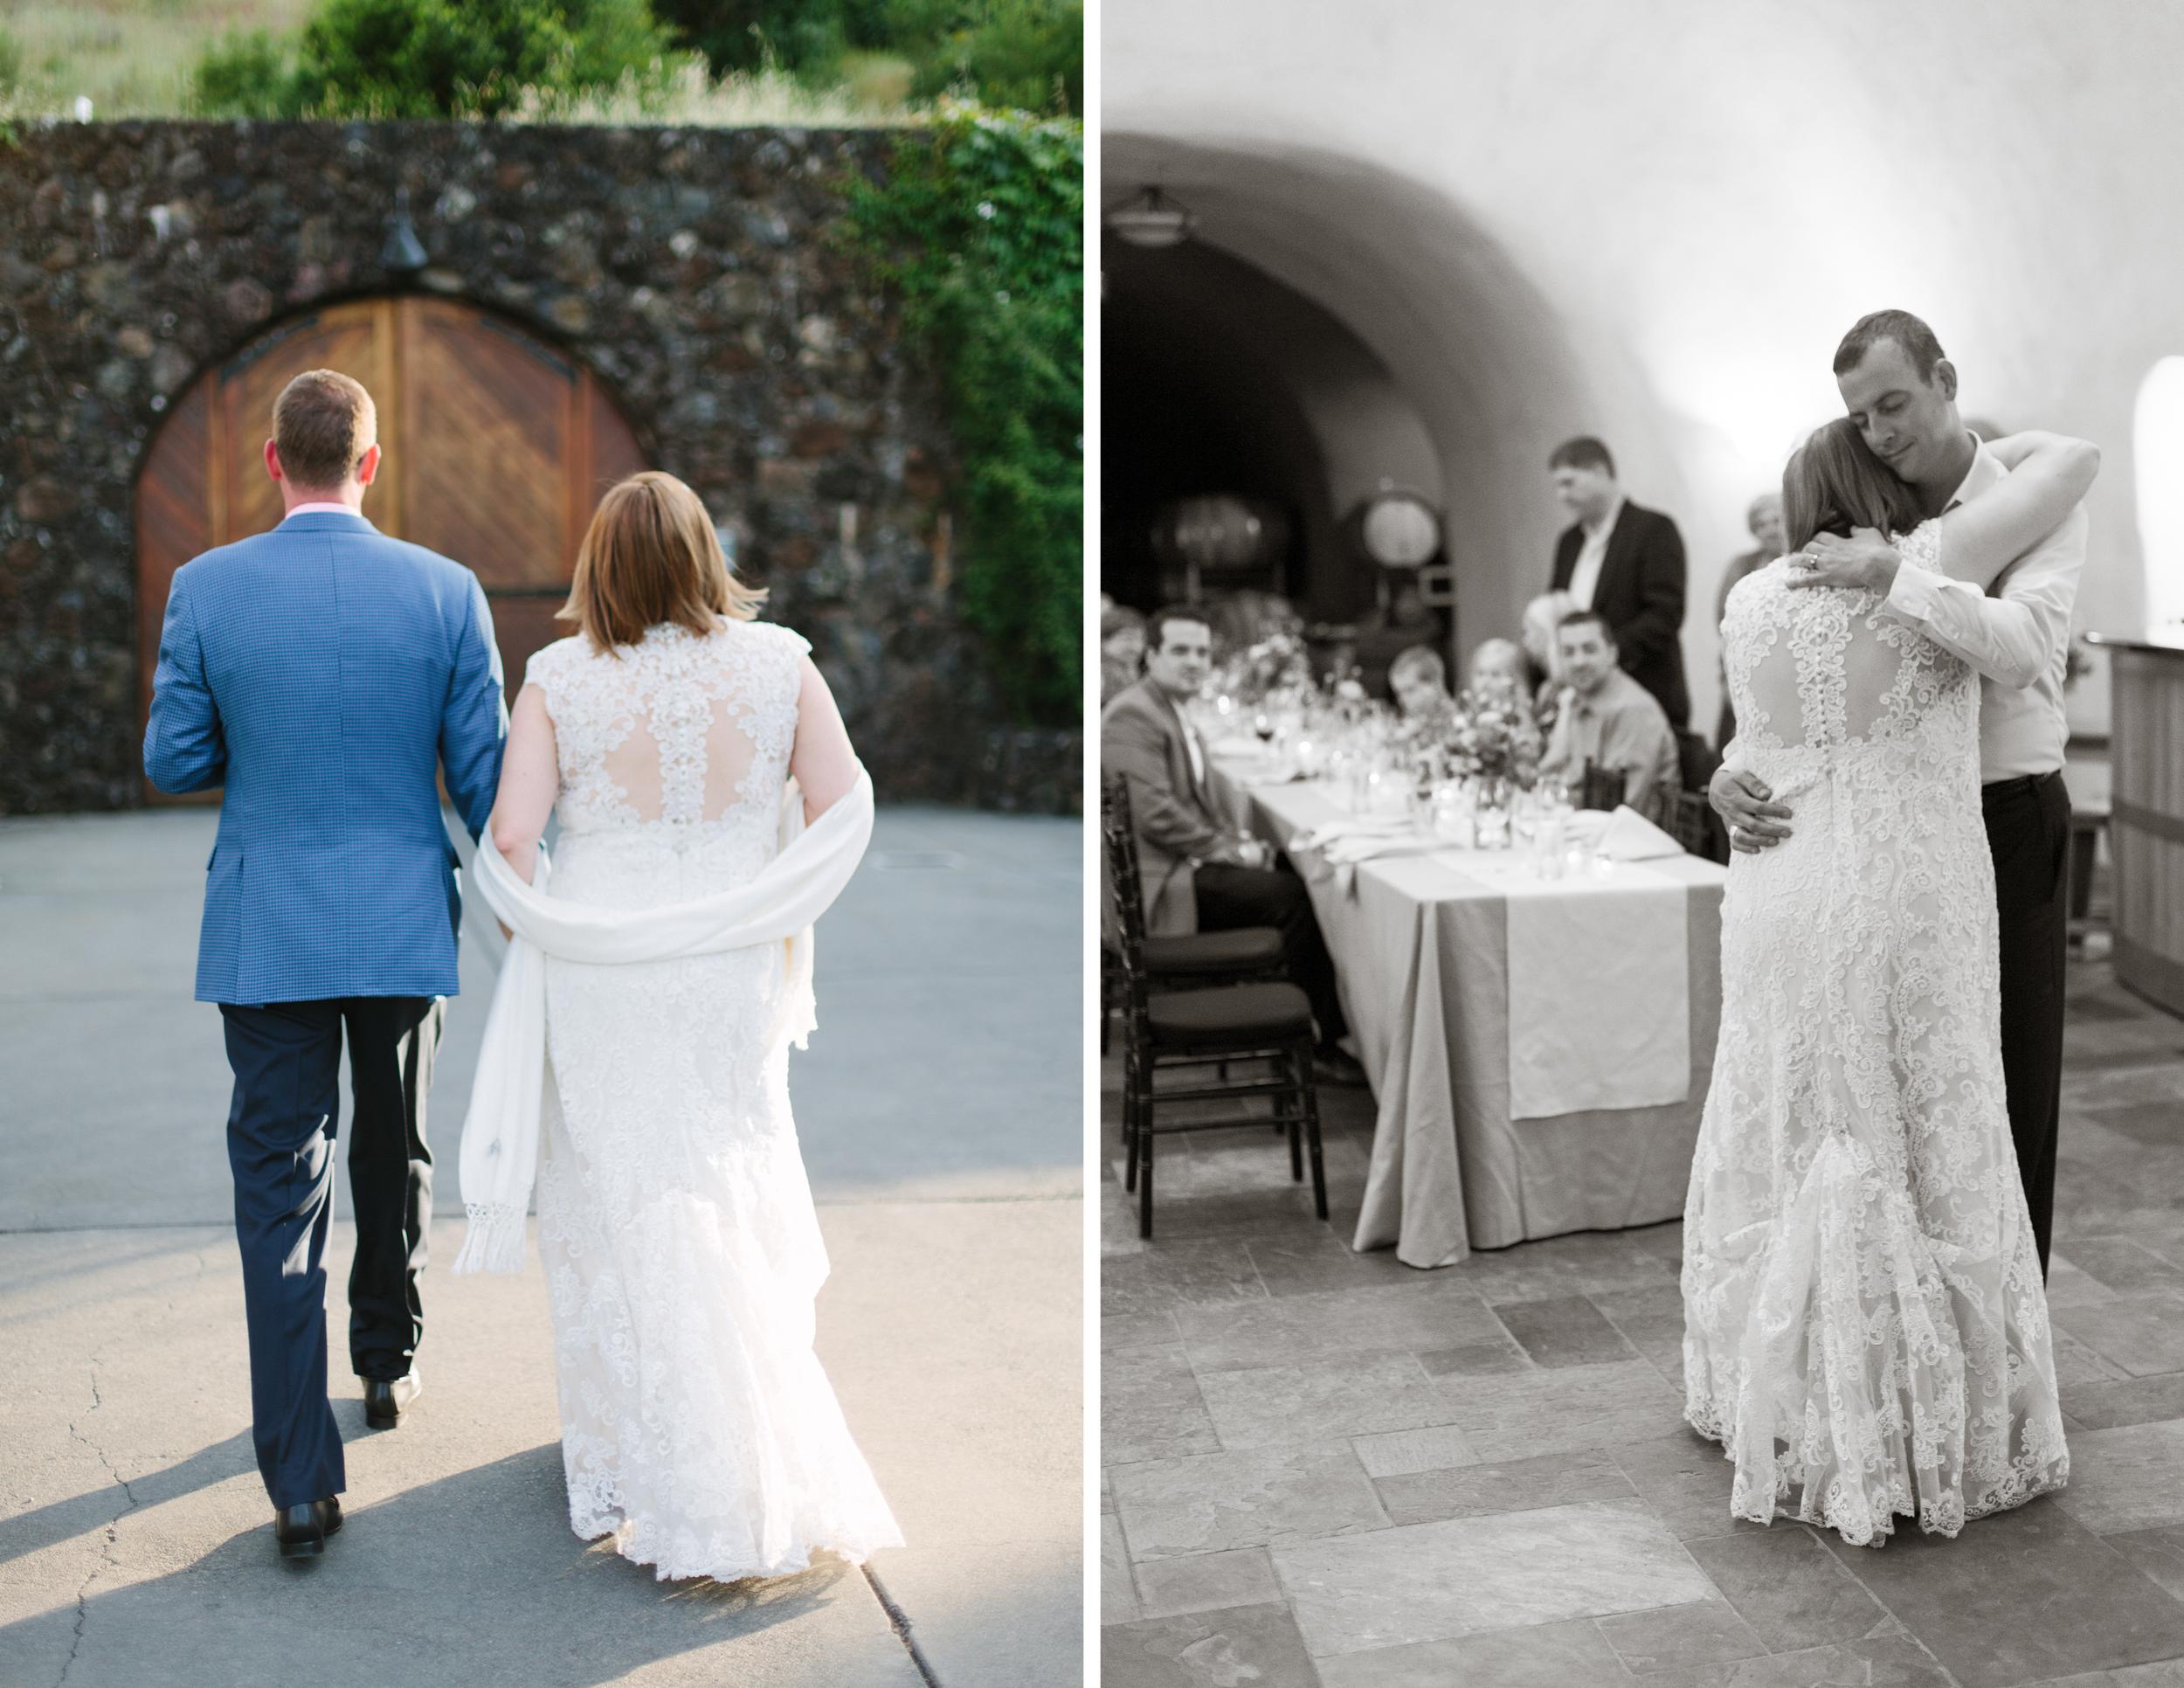 sonoma winery wedding 7.jpg